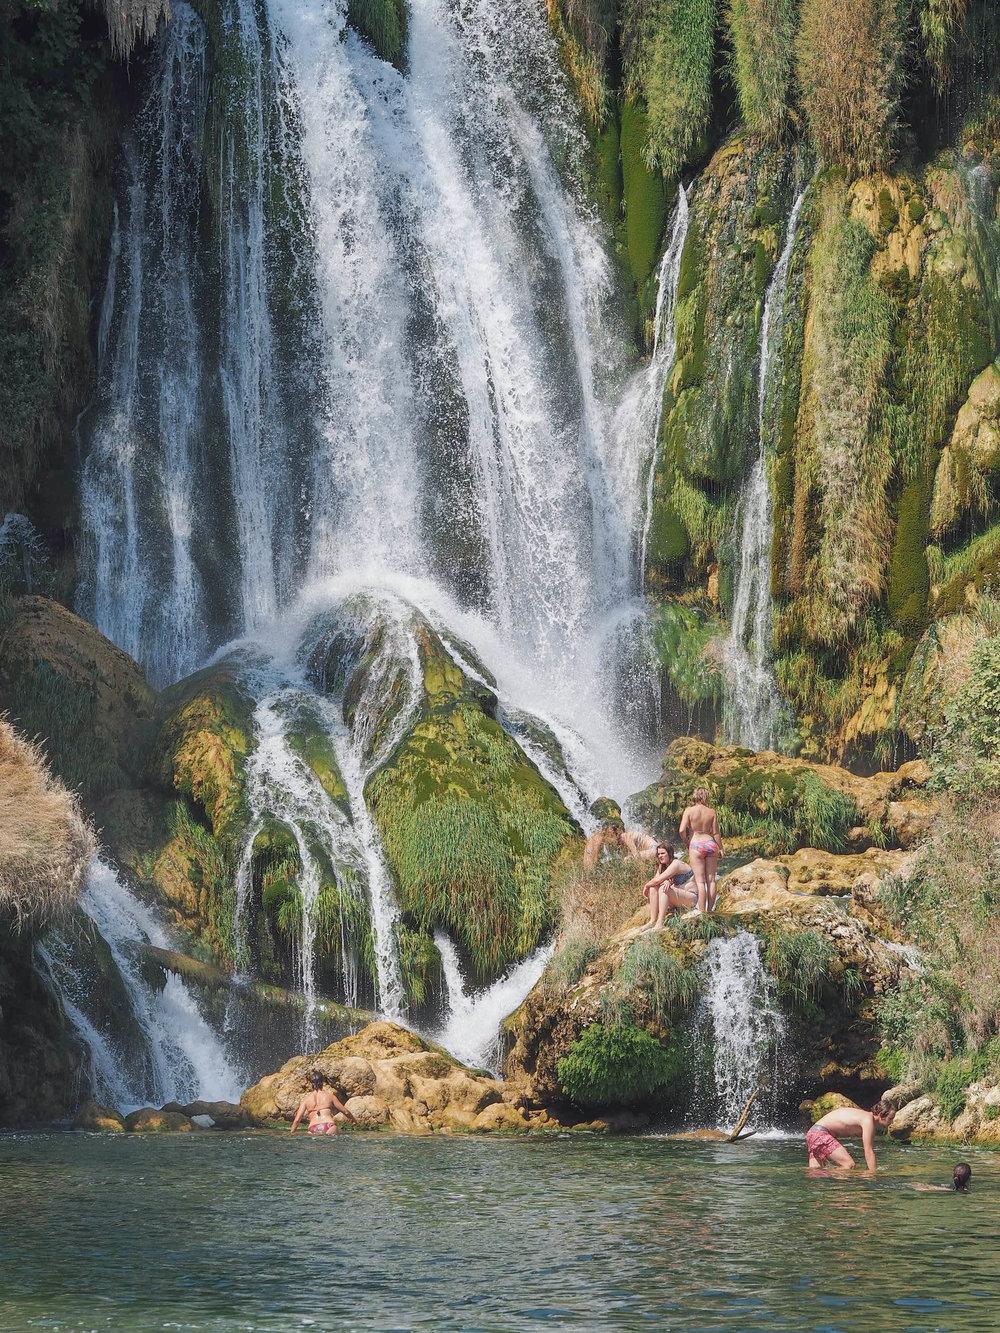 kravice-waterfall-bosnia-herzegovina-07